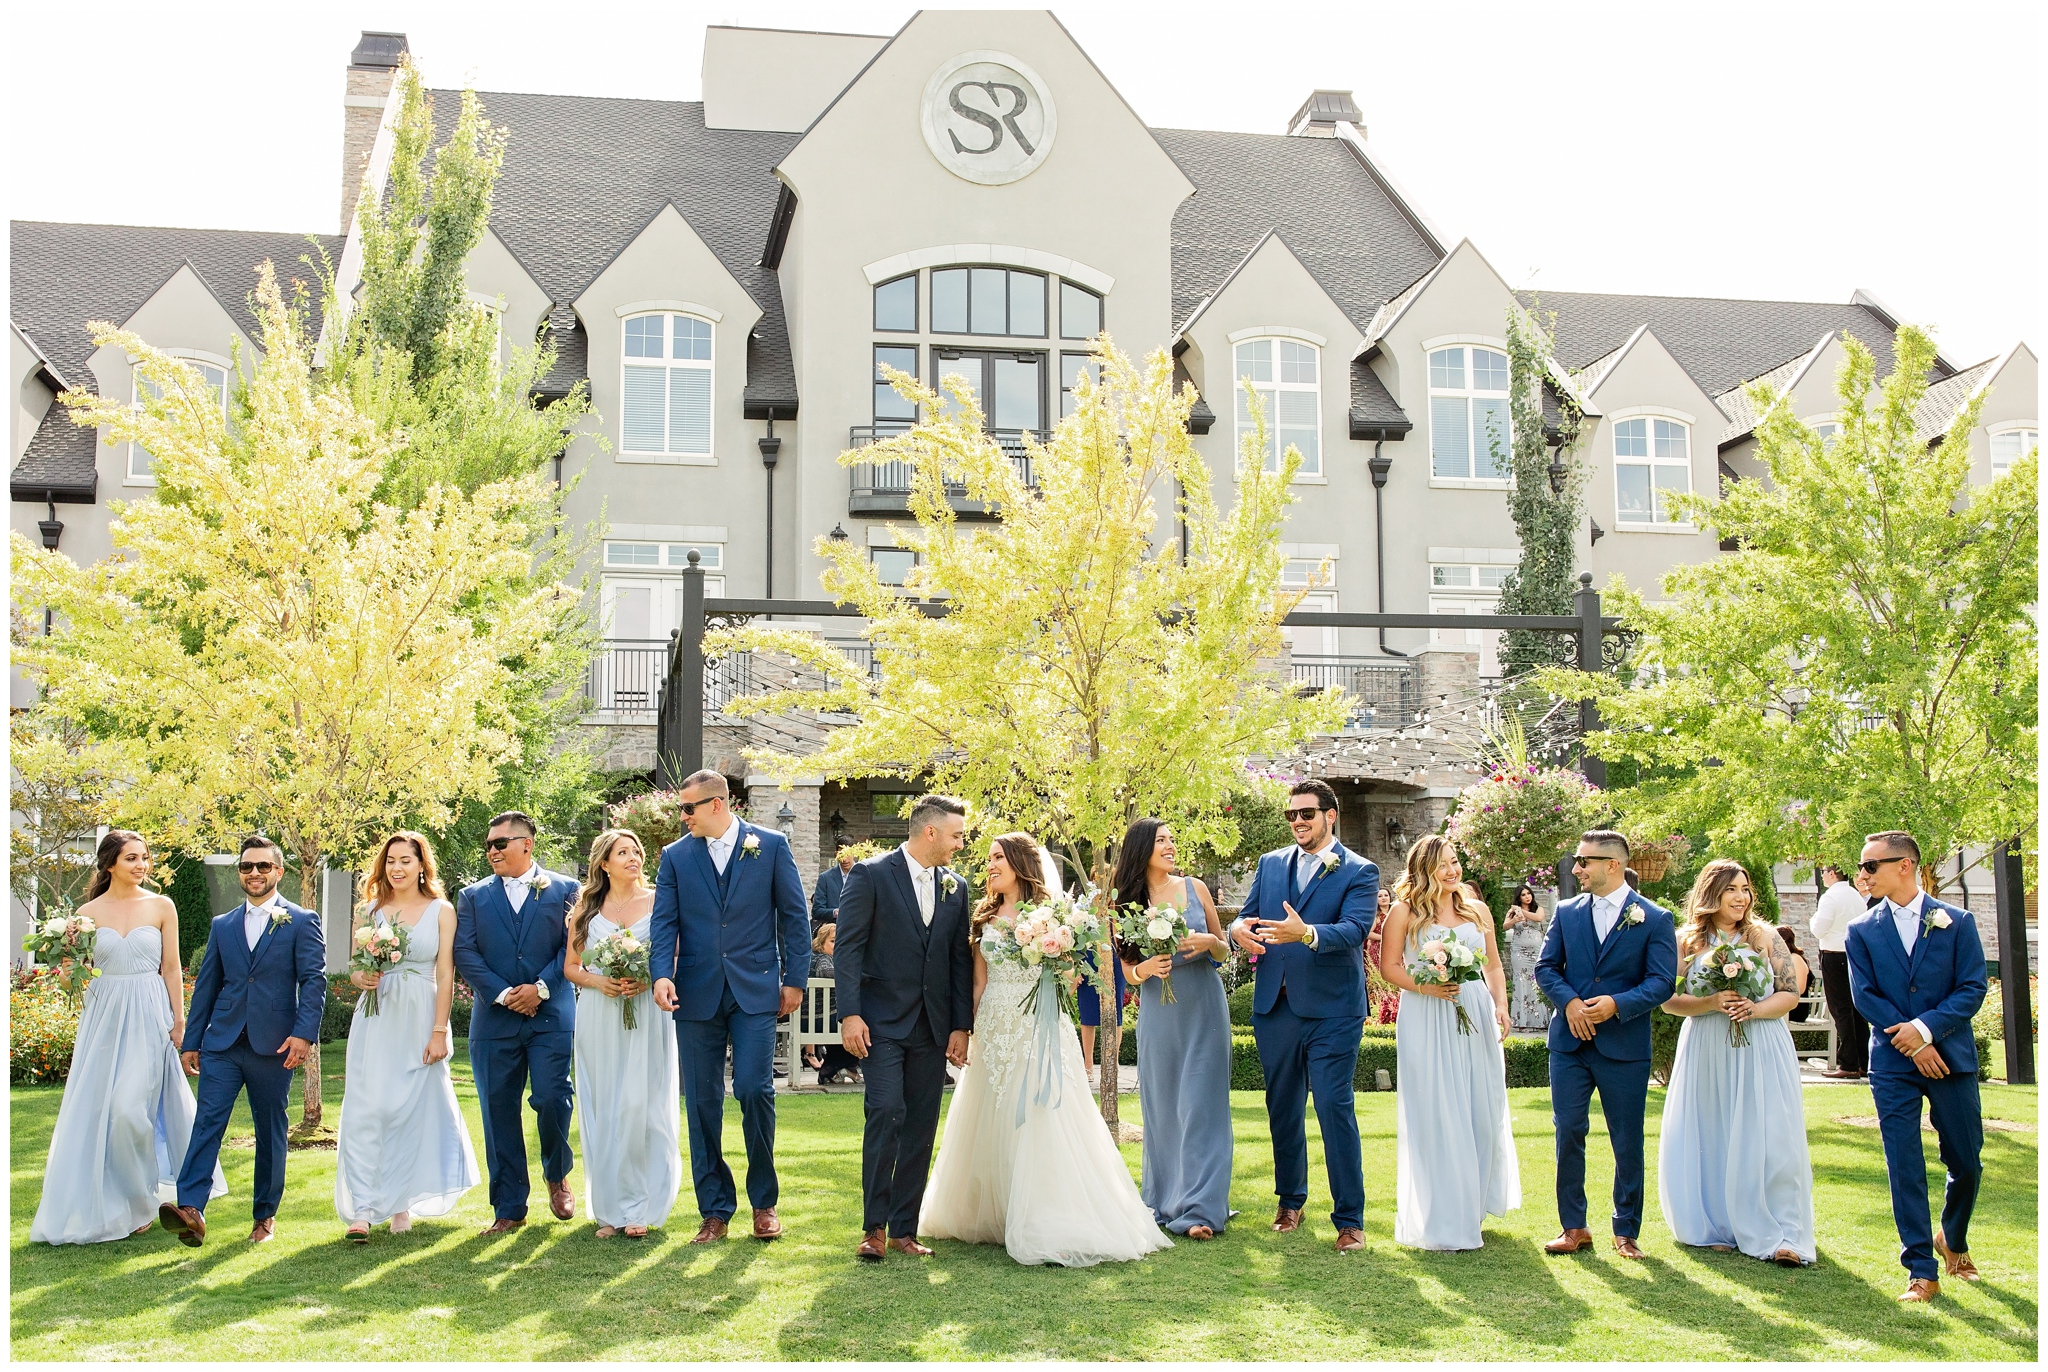 Wedding Party photo at Sleepy Ridge Wedding Venue